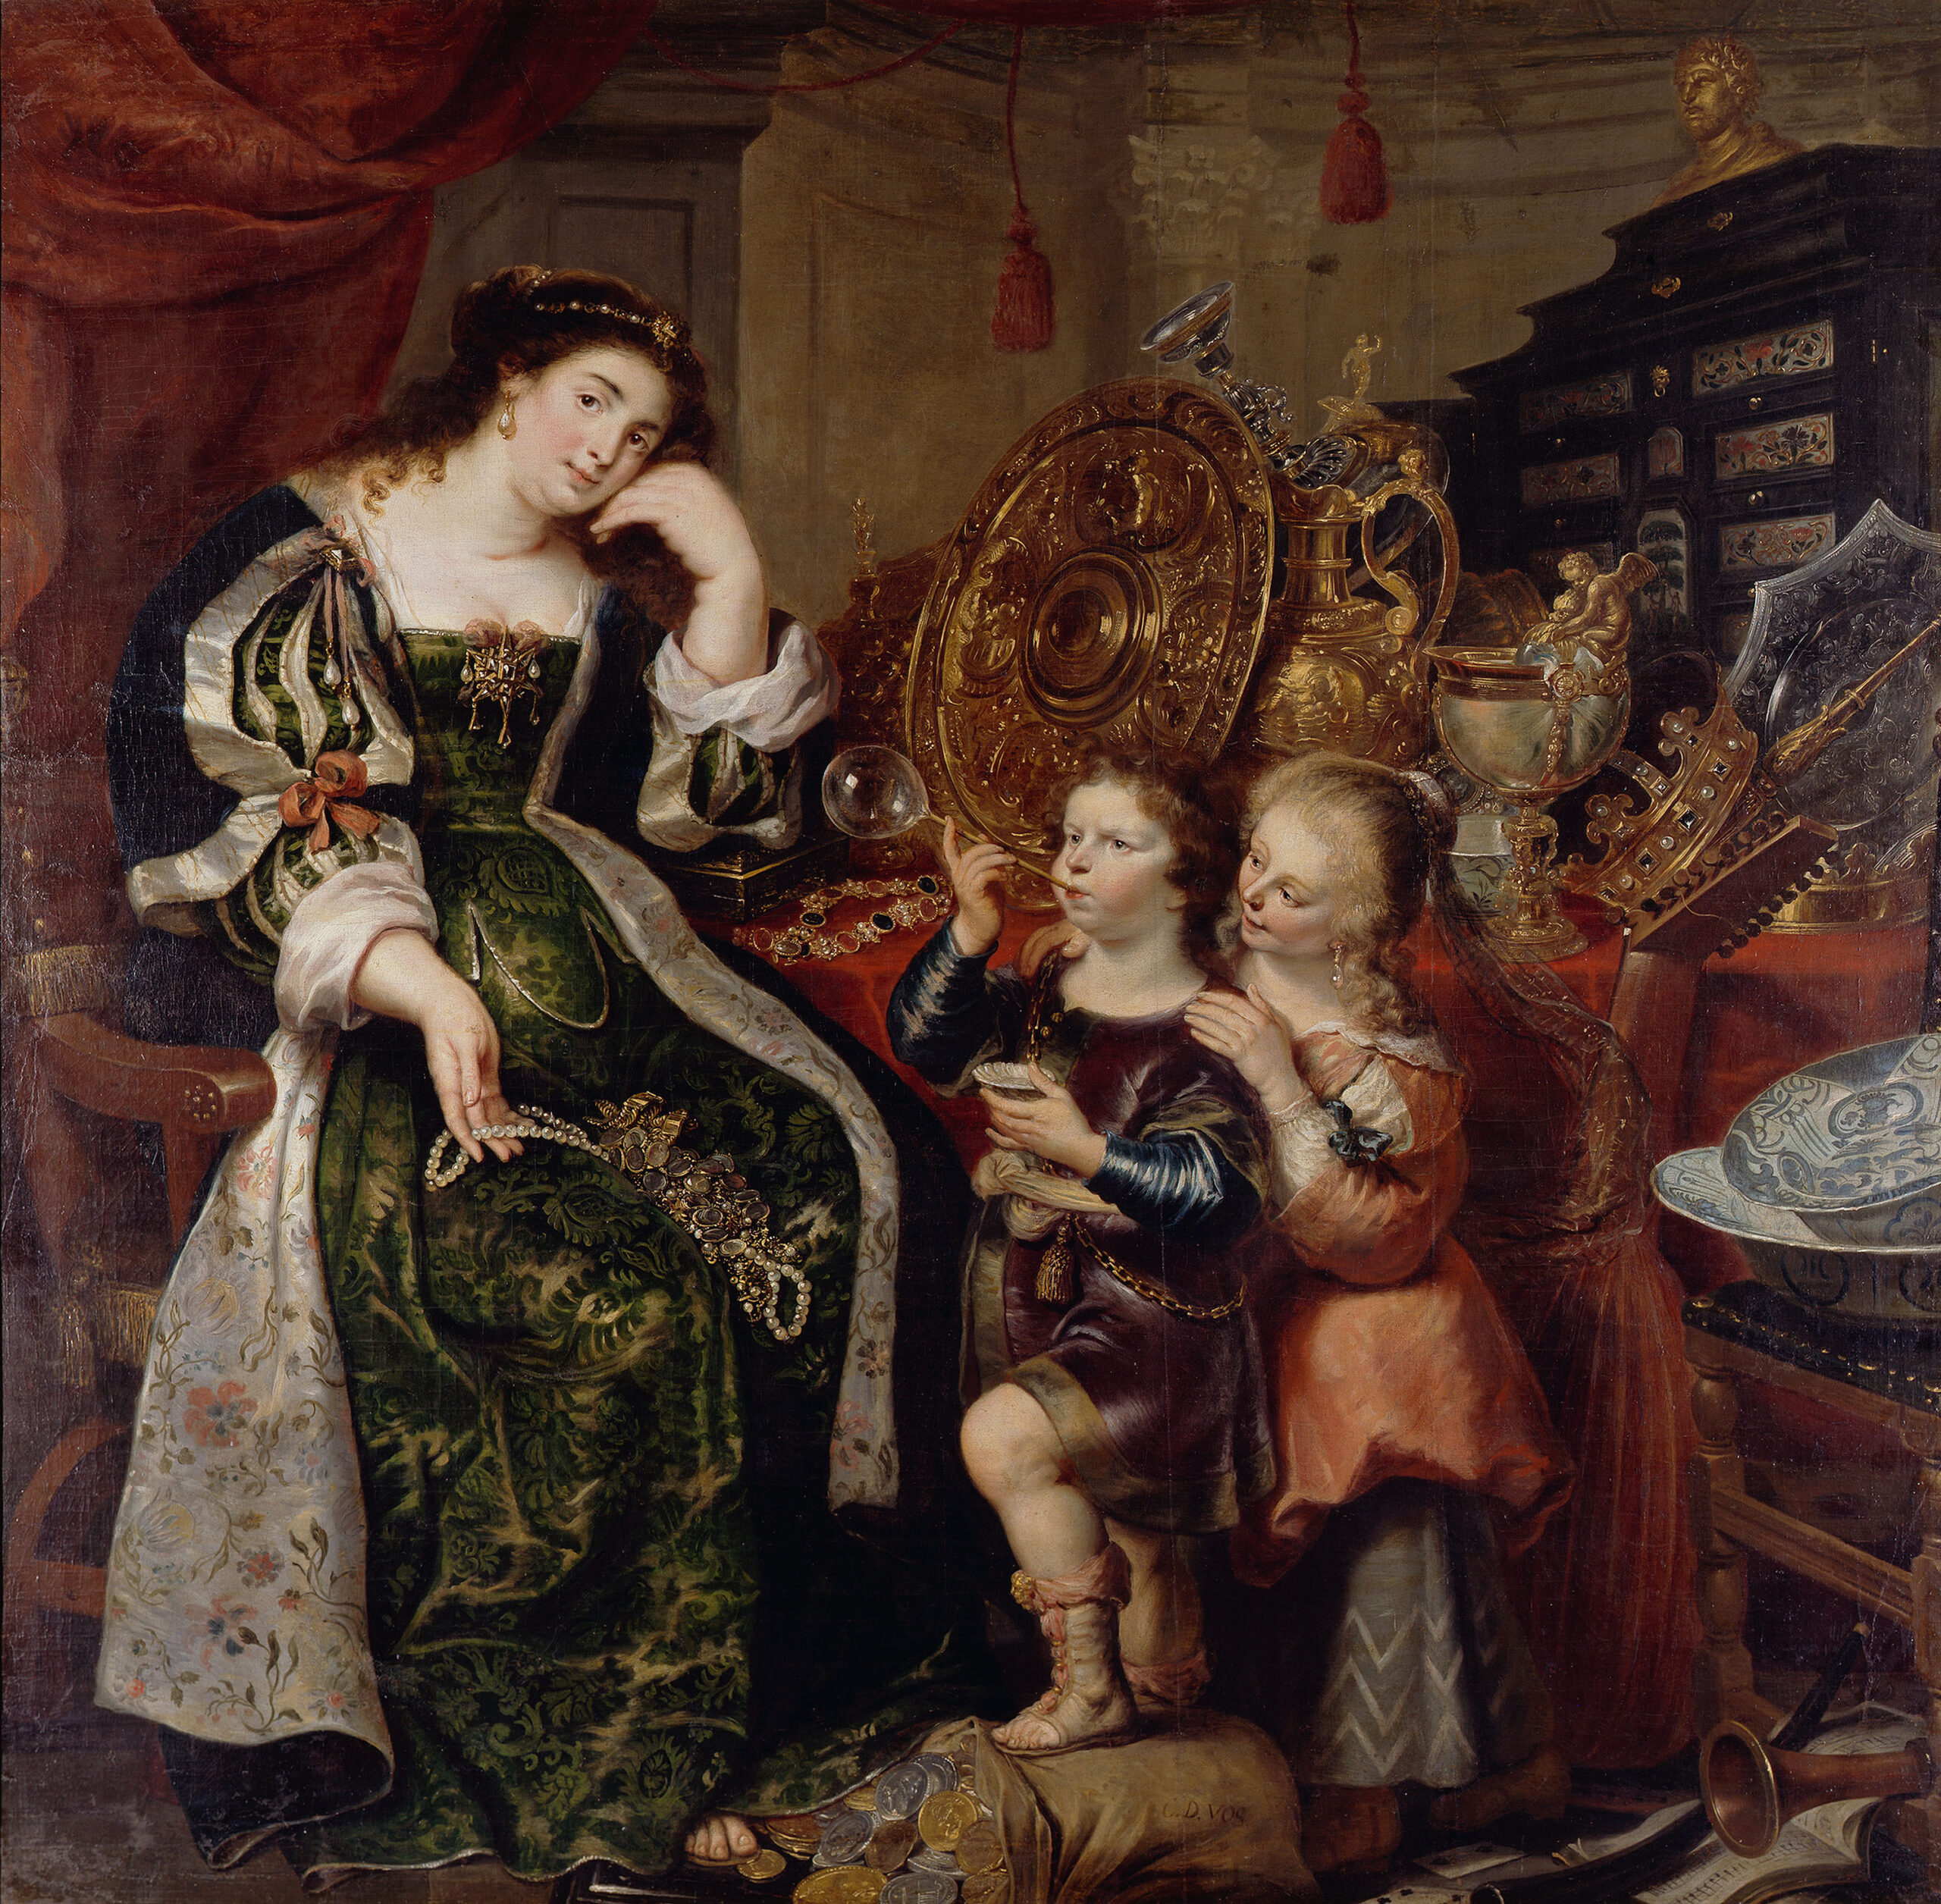 Fig. 5. Cornelis de Vos (ca. 1584/85-1651), Allegory of Vanity, ca. 1626, canvas, 190 x 194 cm Herzog Anton Ulrich-Museum Braunschweig, inv. no. GG 109